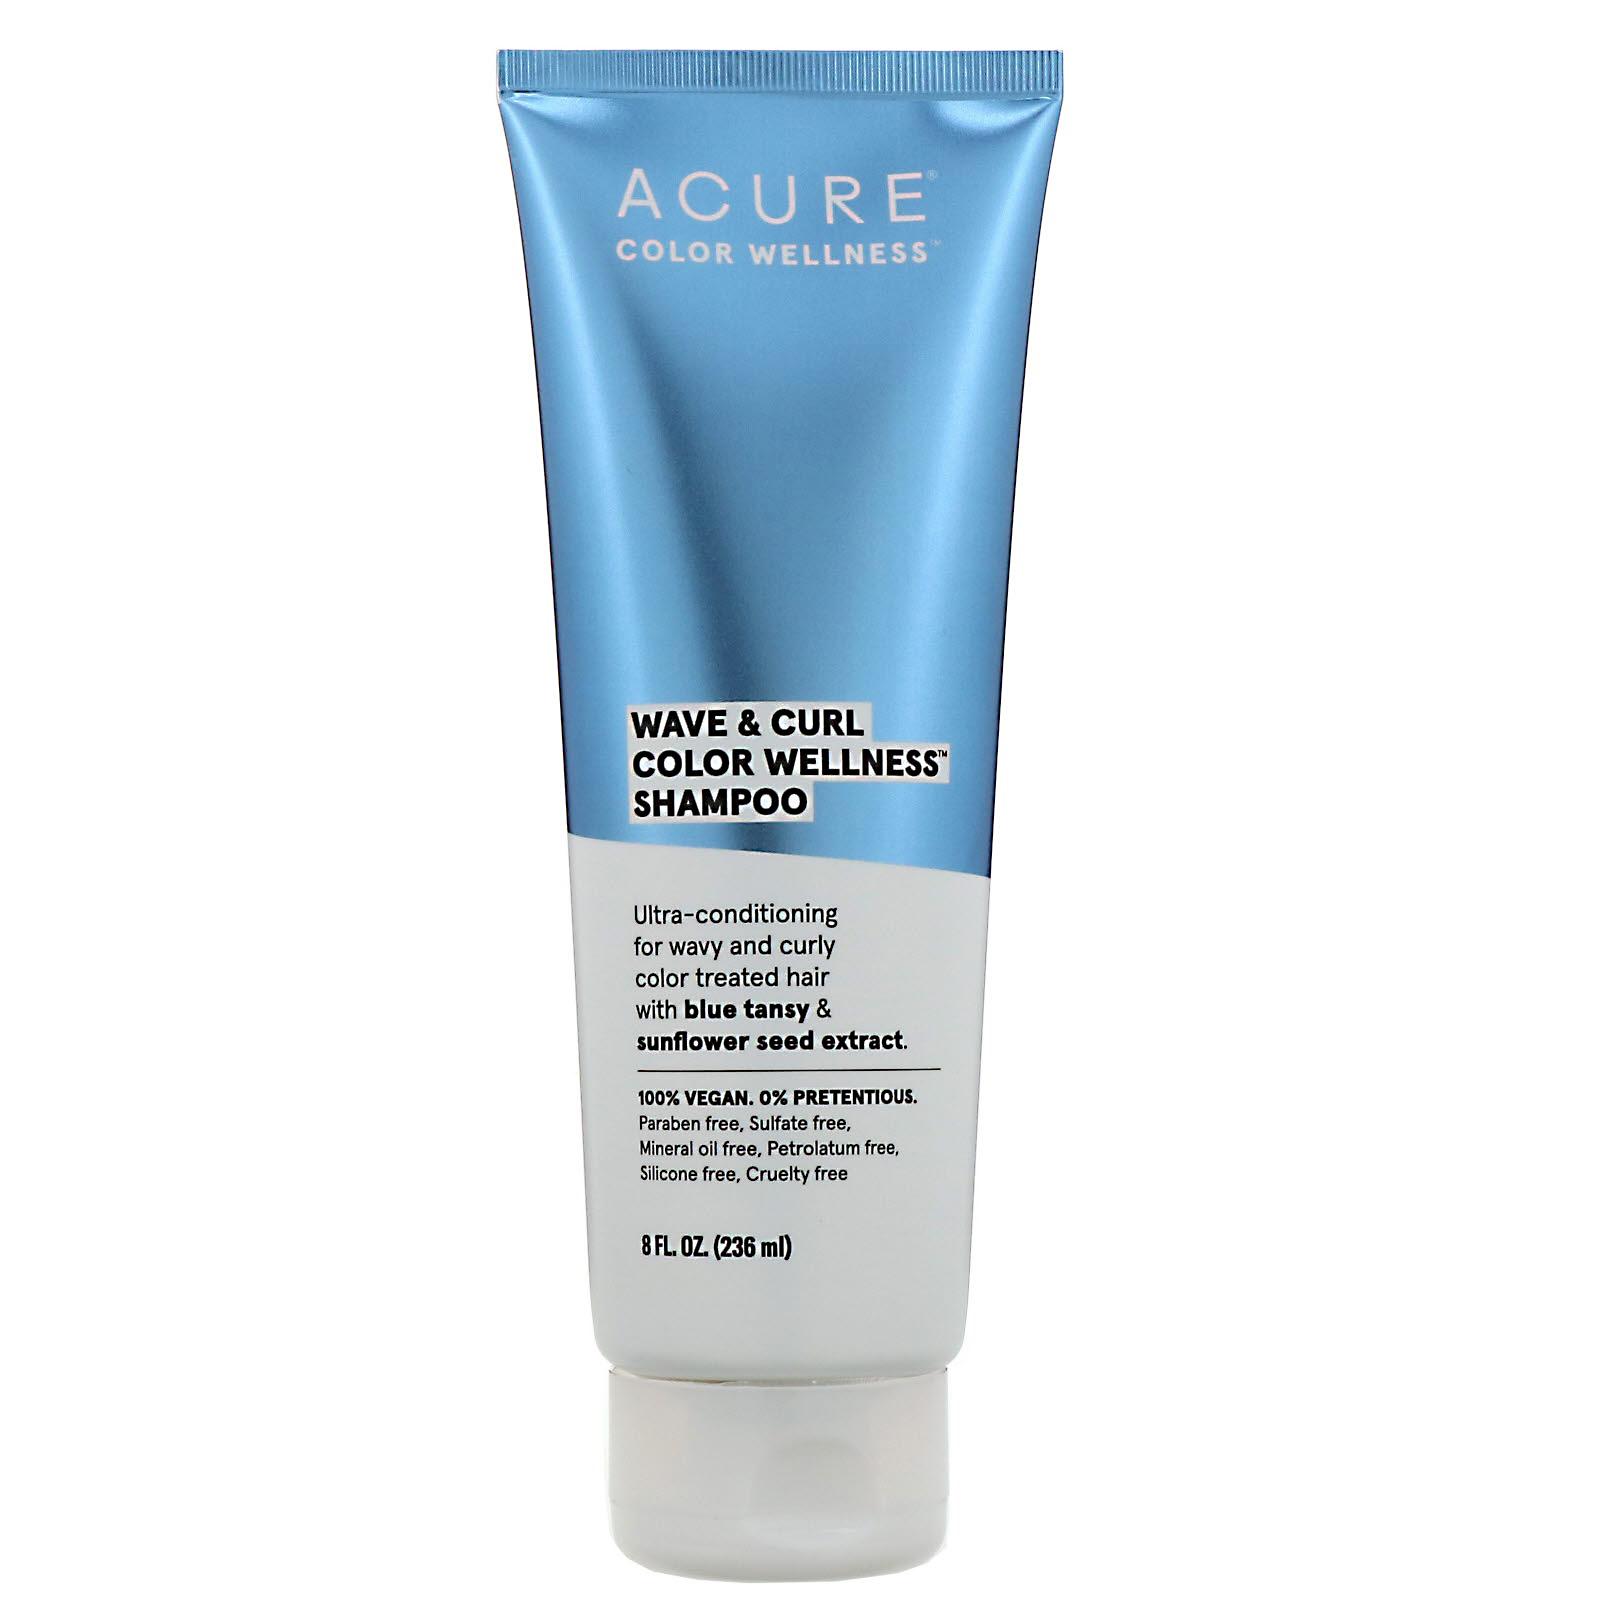 Acure Wave Curl Color Wellness Shampoo 8 Fl Oz 236 Ml